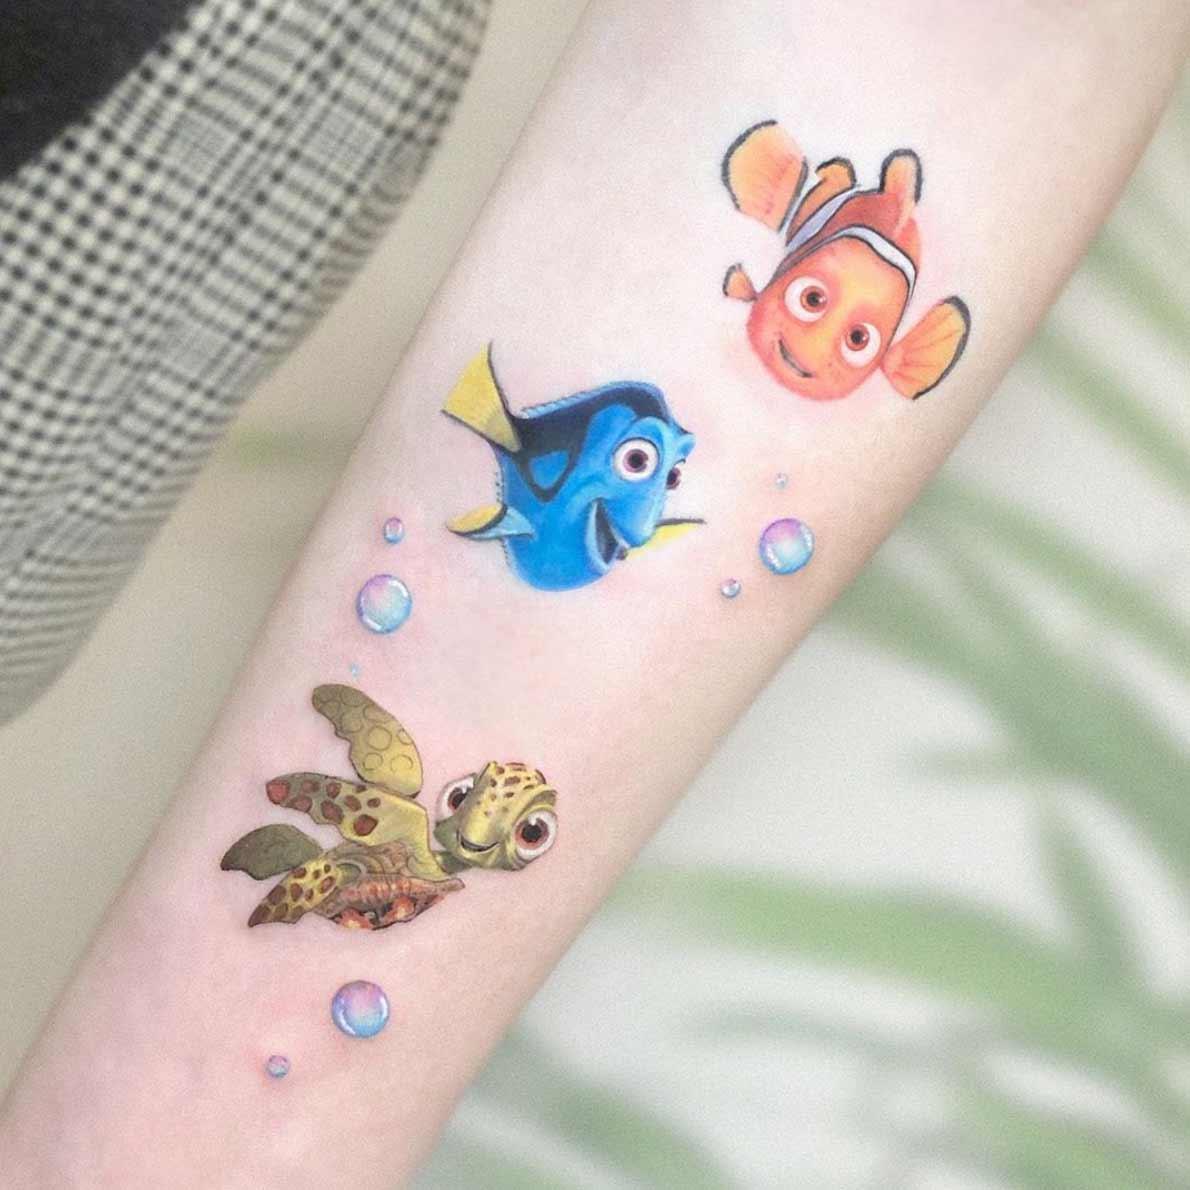 Gestochene Popkultur-Liebe von Eden Kozokaro aka Kozo Tattoo kozo-tattoos_10